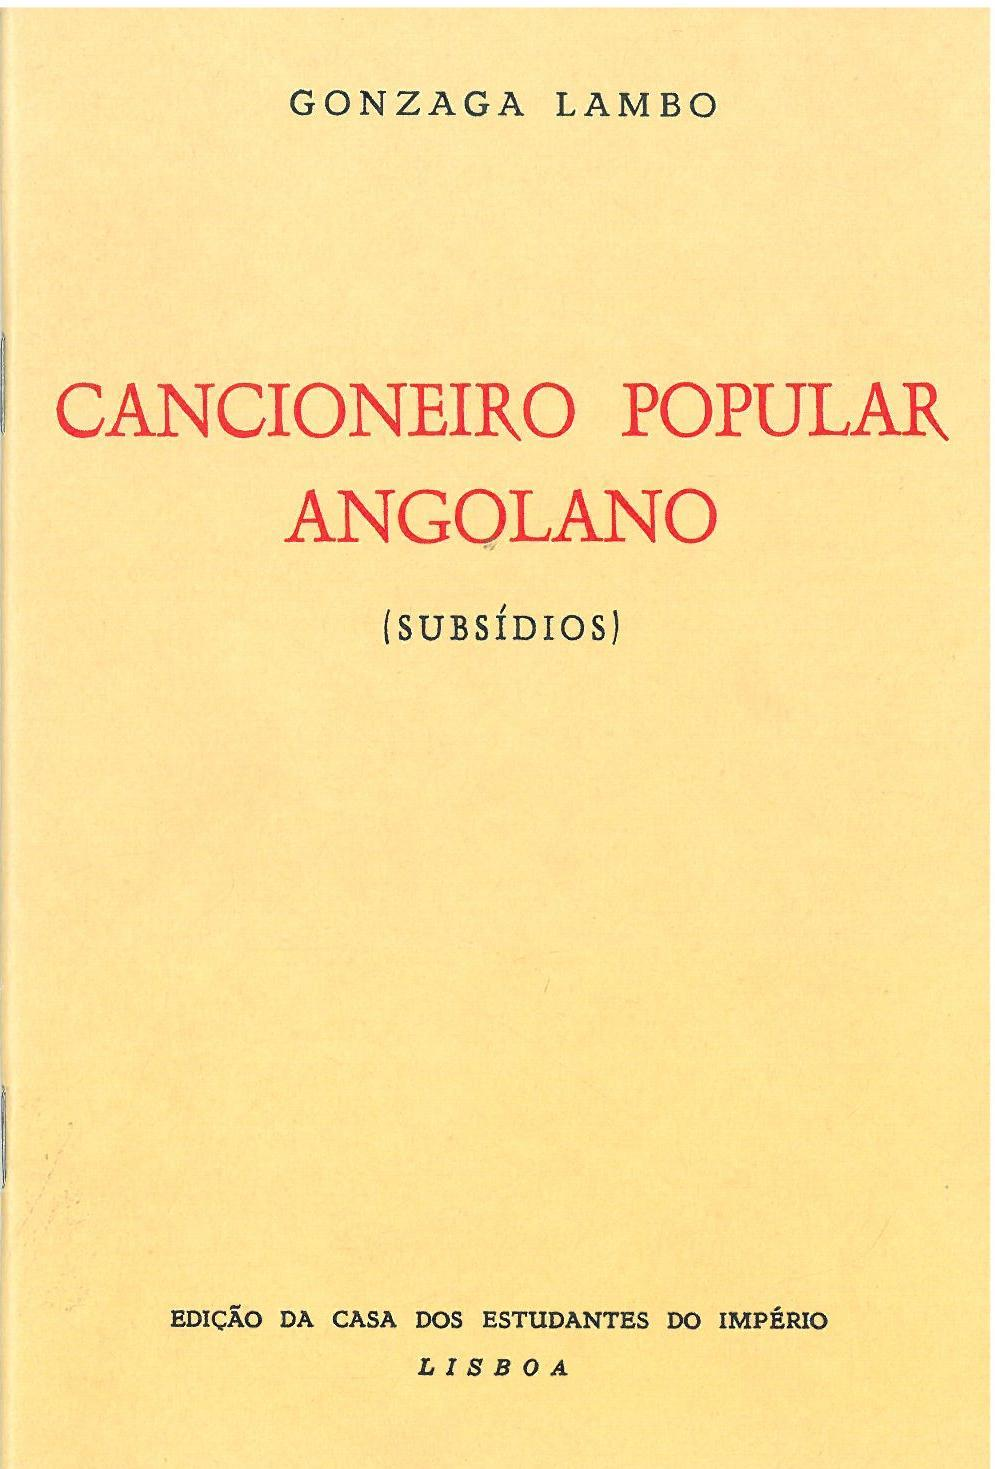 Cancioneiro popular angolano_.jpg